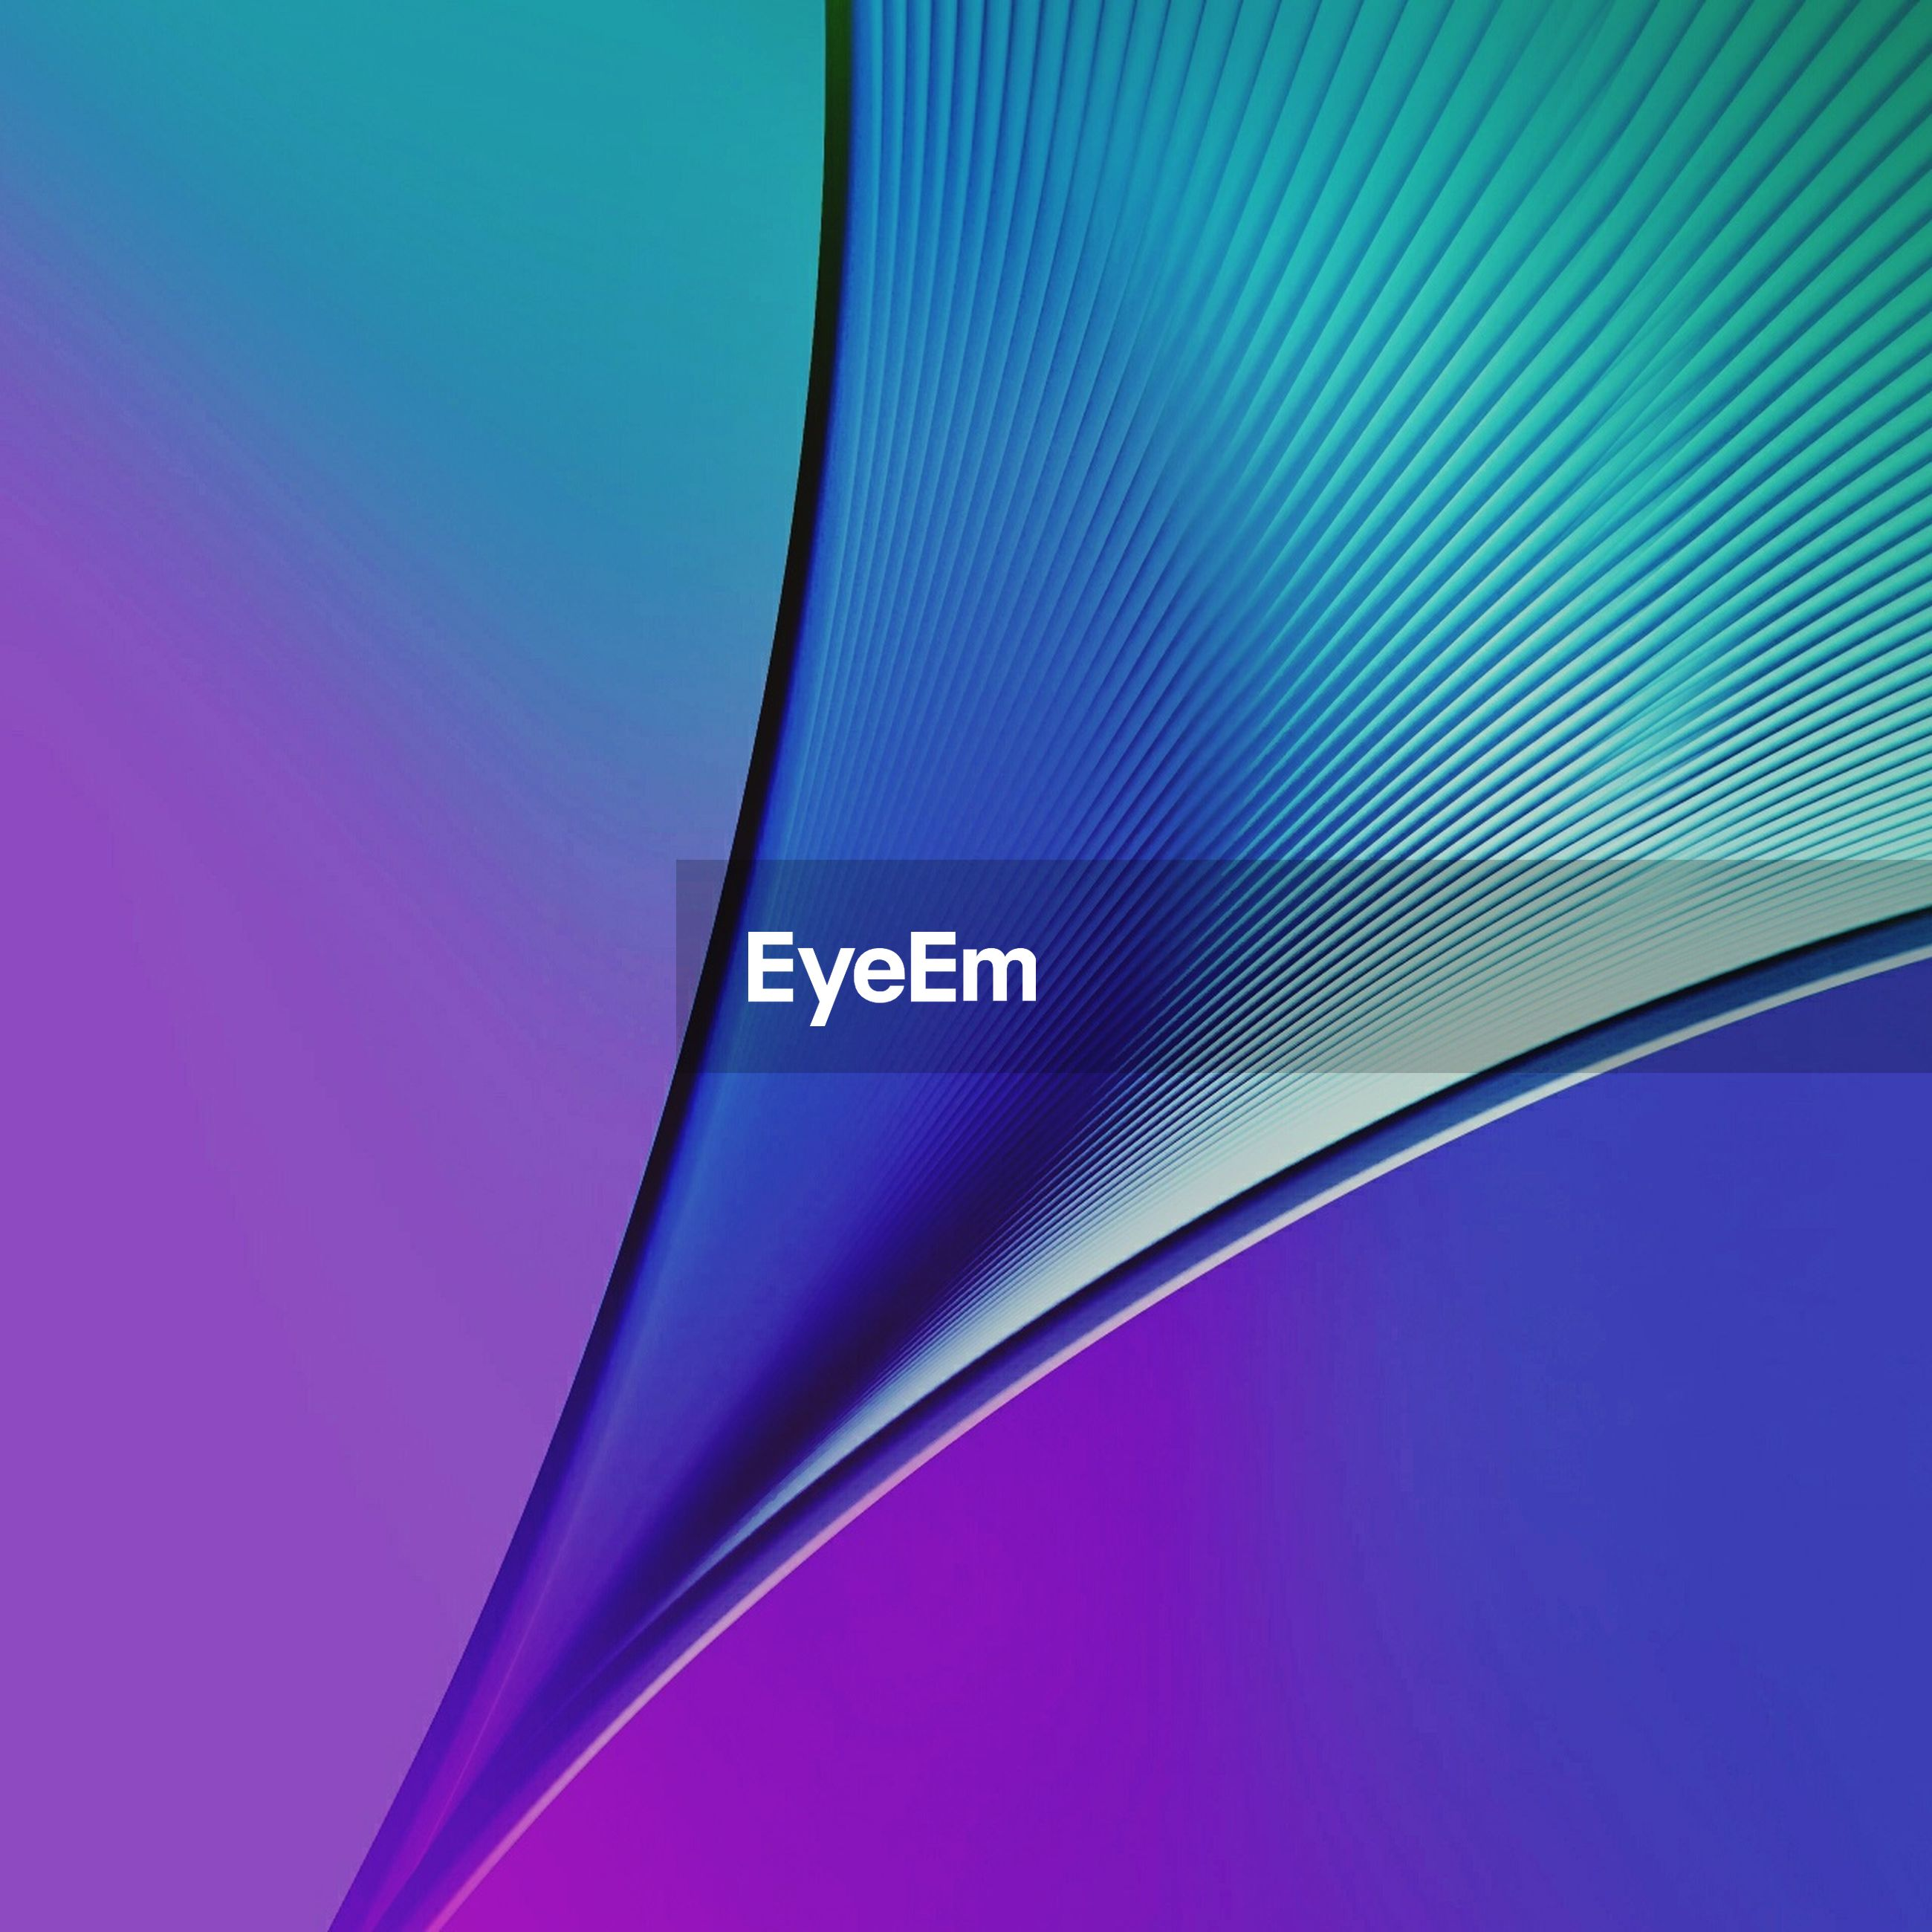 close-up, low angle view, blue, dark, purple, studio shot, vibrant color, tall, modern, no people, man made object, geometric shape